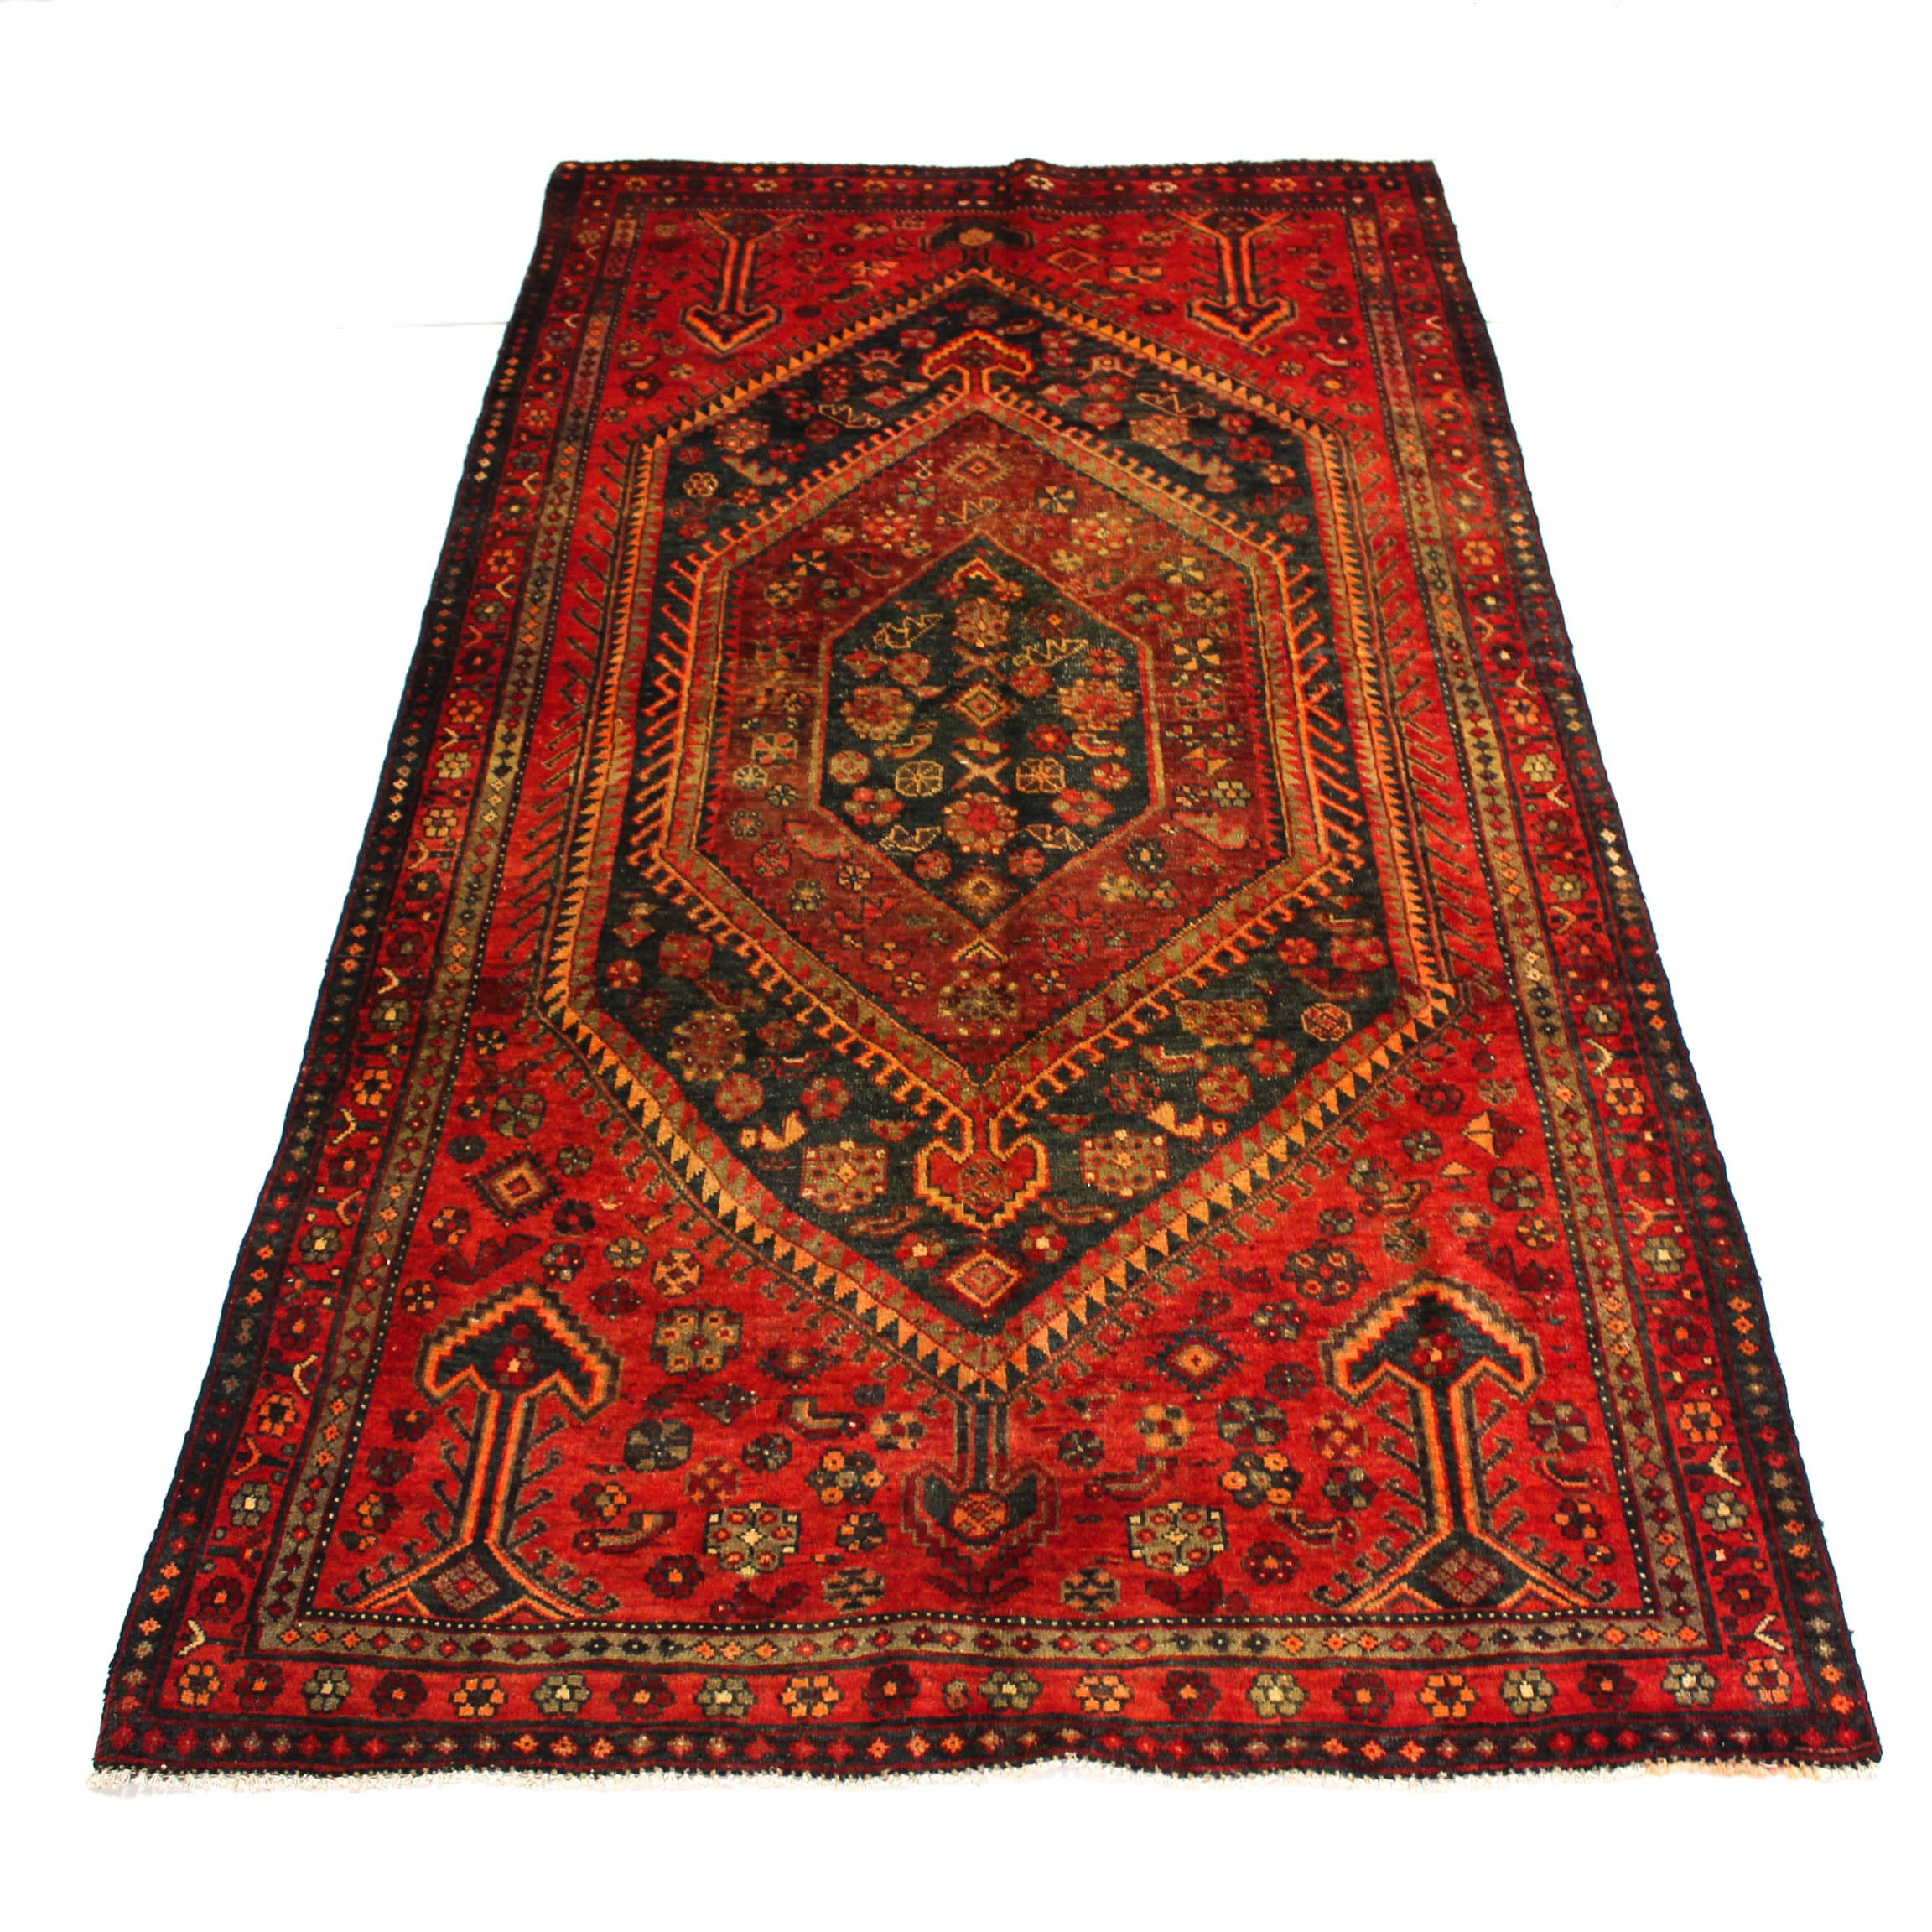 4'8 x 8'9 Semi-Antique Hand-Knotted Persian Bidjar Rug